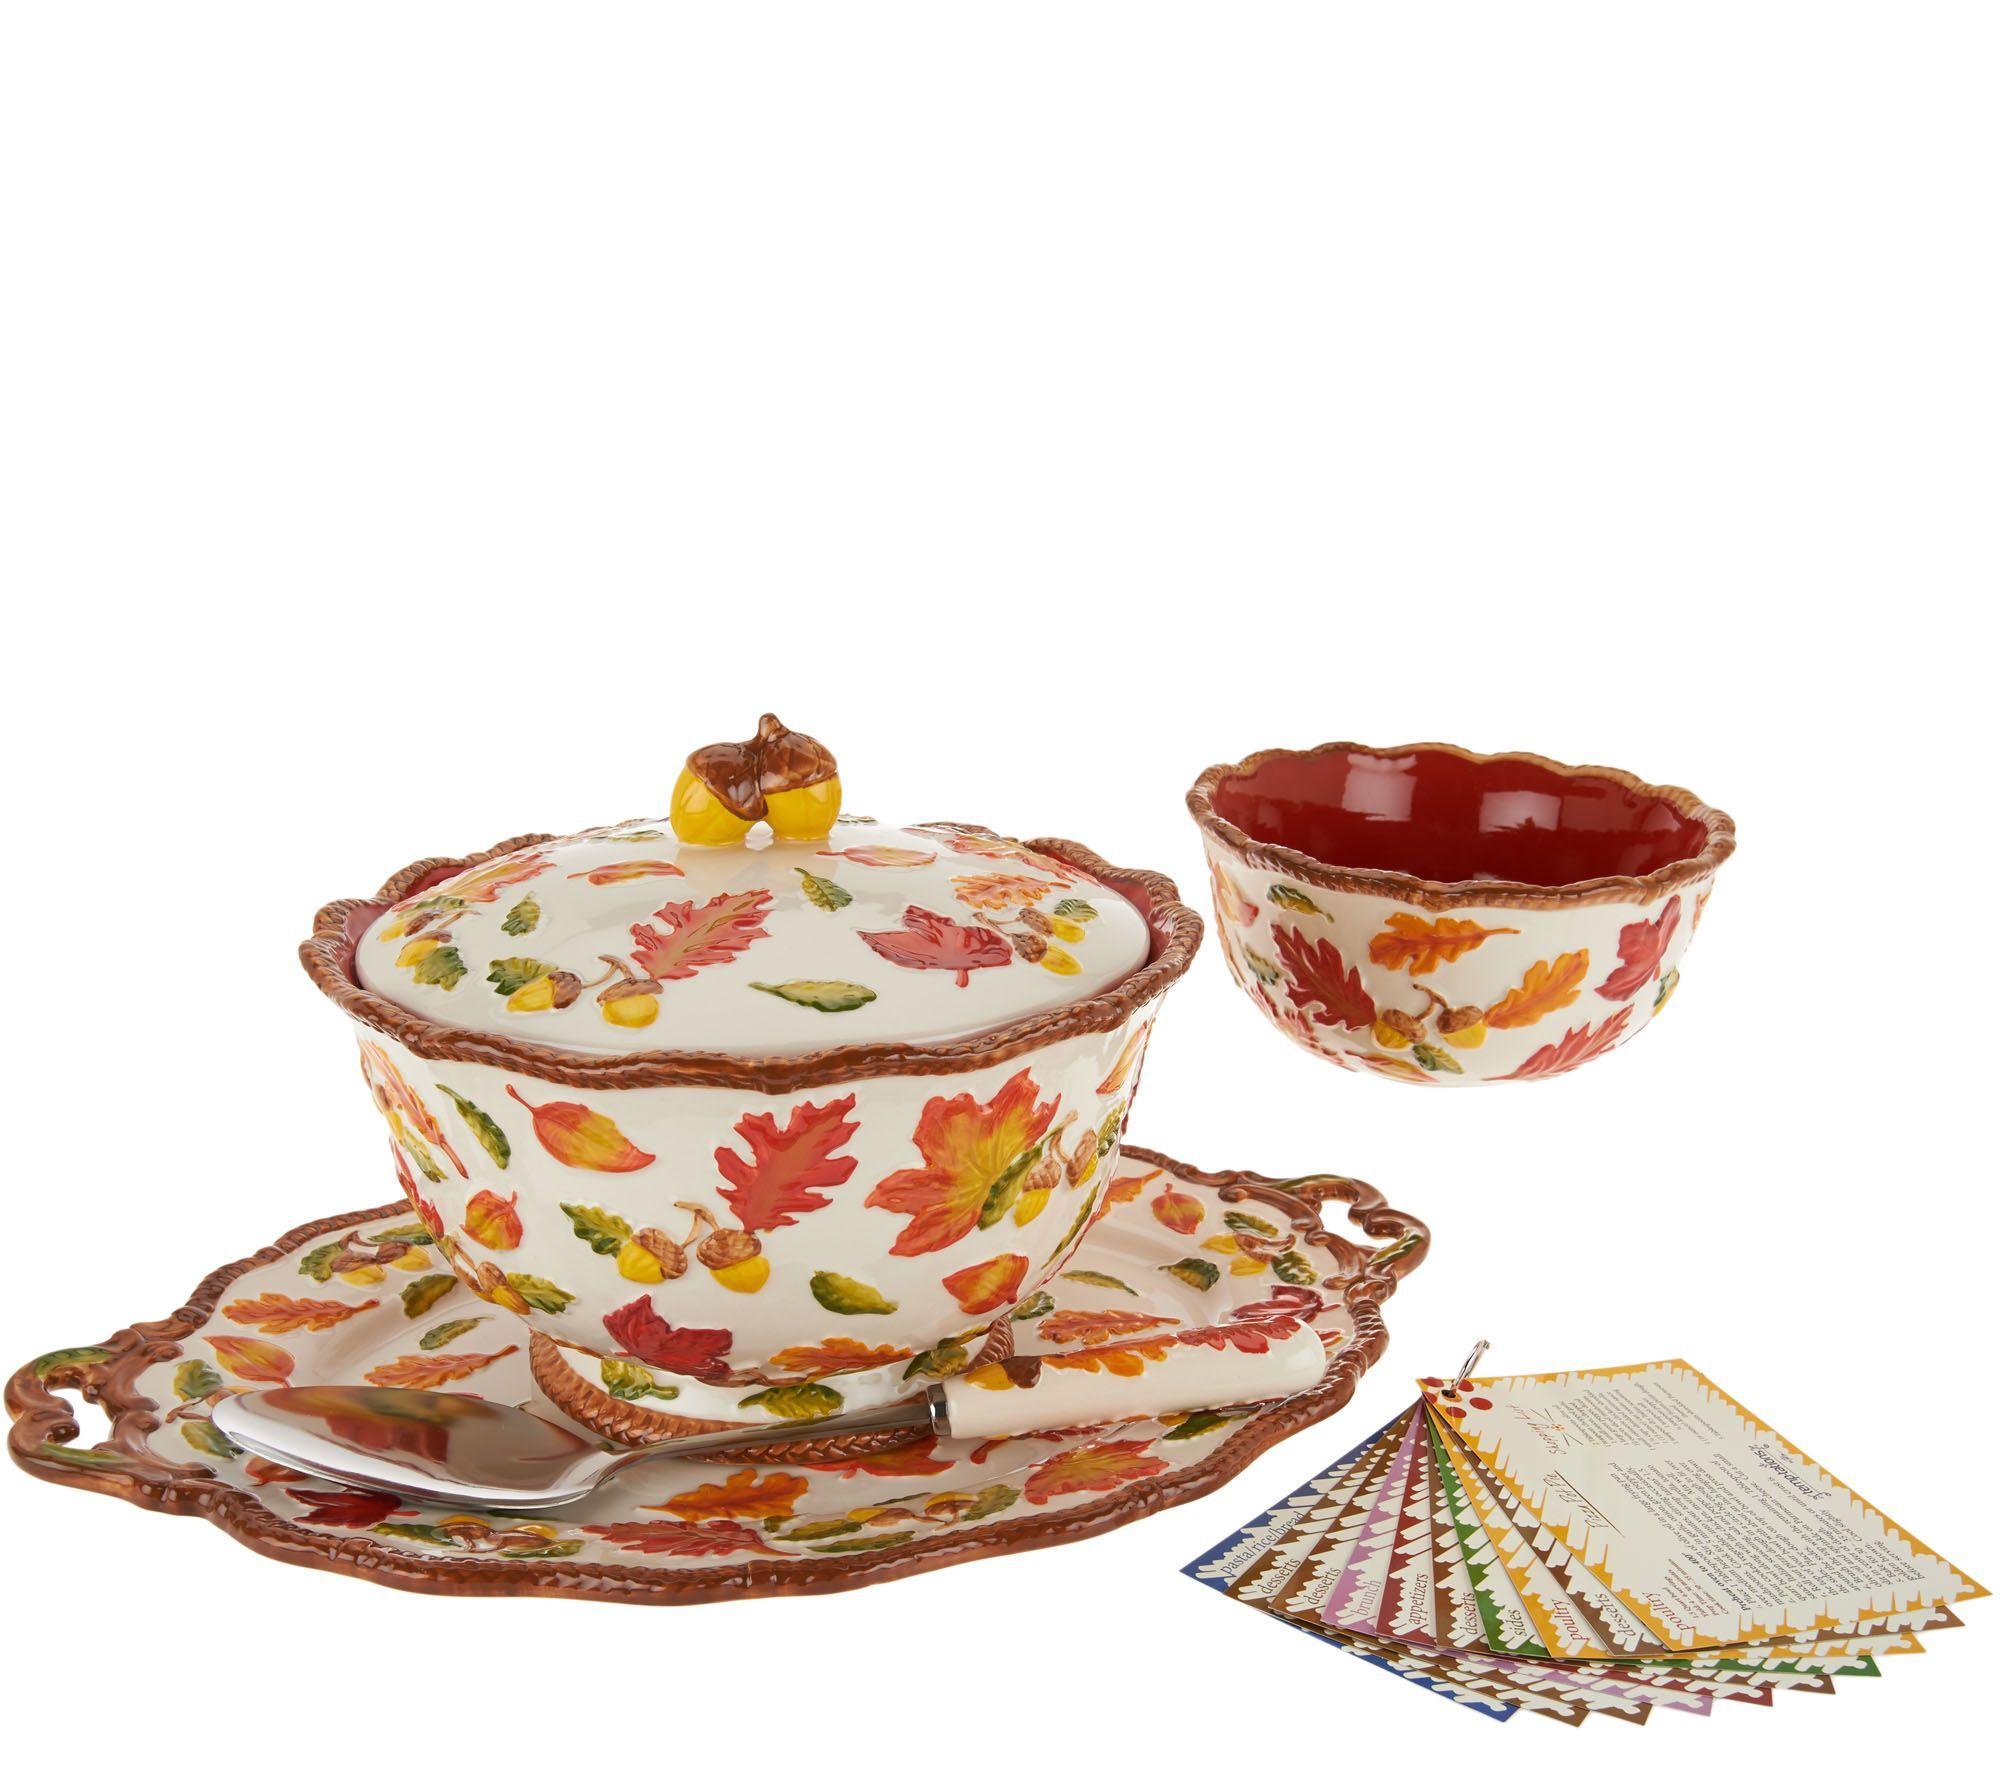 Serving platters image by ᒪᗩᐯeᖇᑎe ᐯeᖇᑎie ᐯeᖇᑎe on House